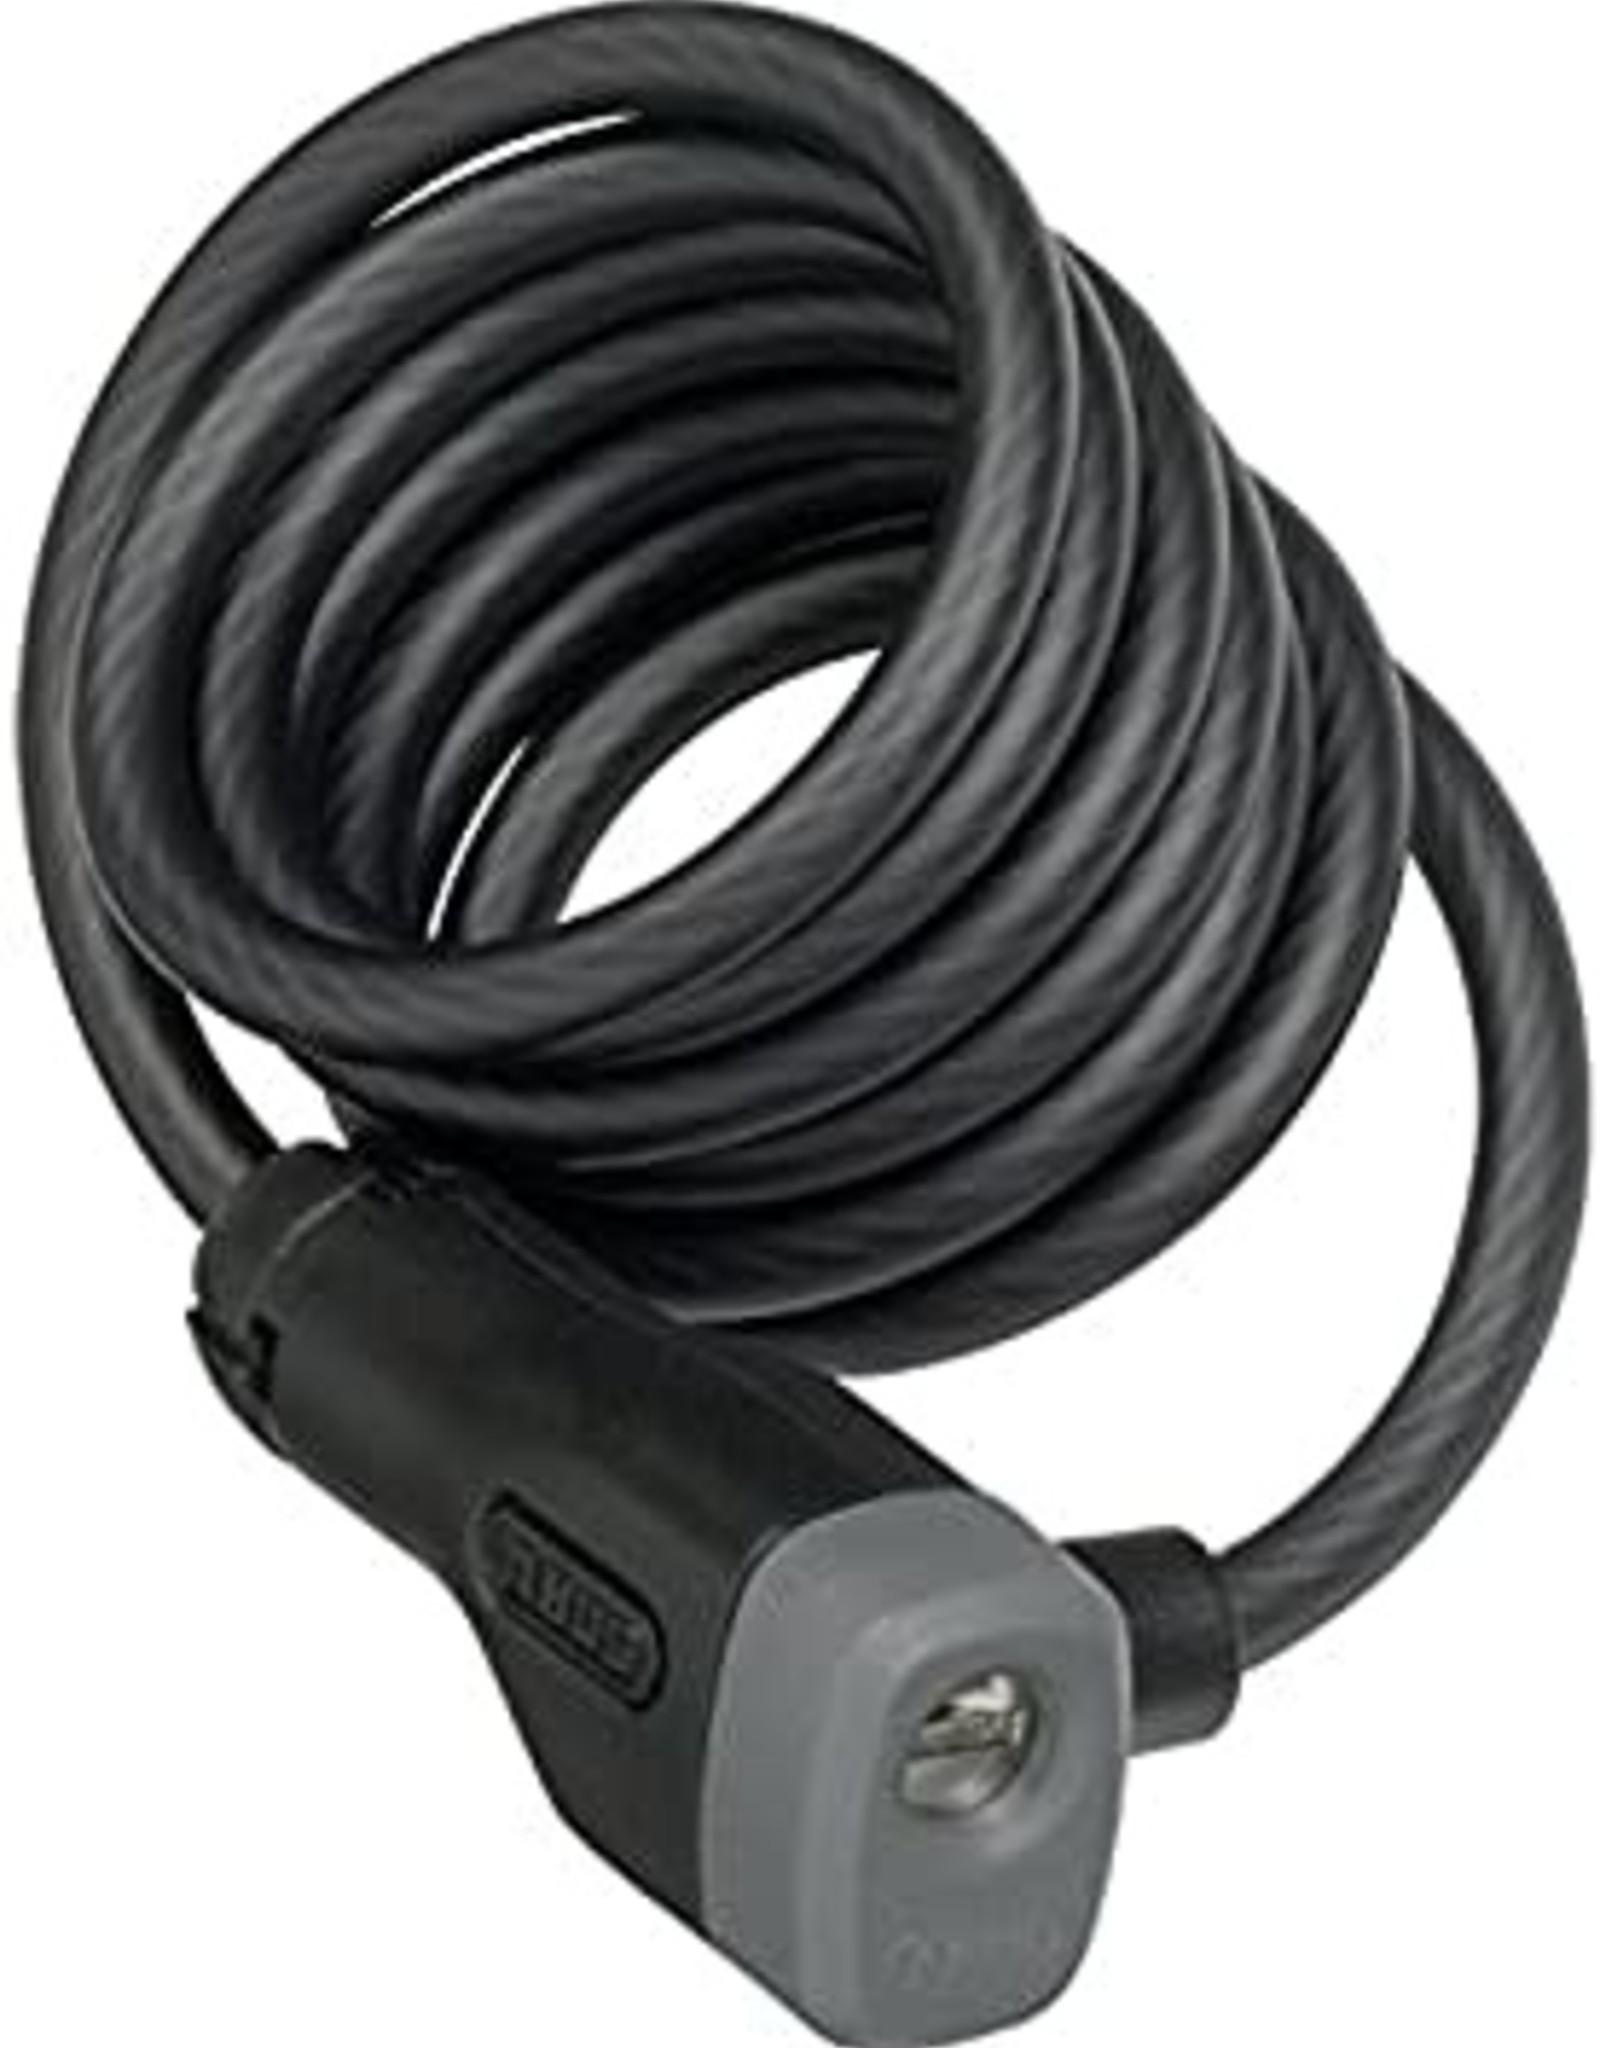 Abus 5510K Cable Lock (Keyed)